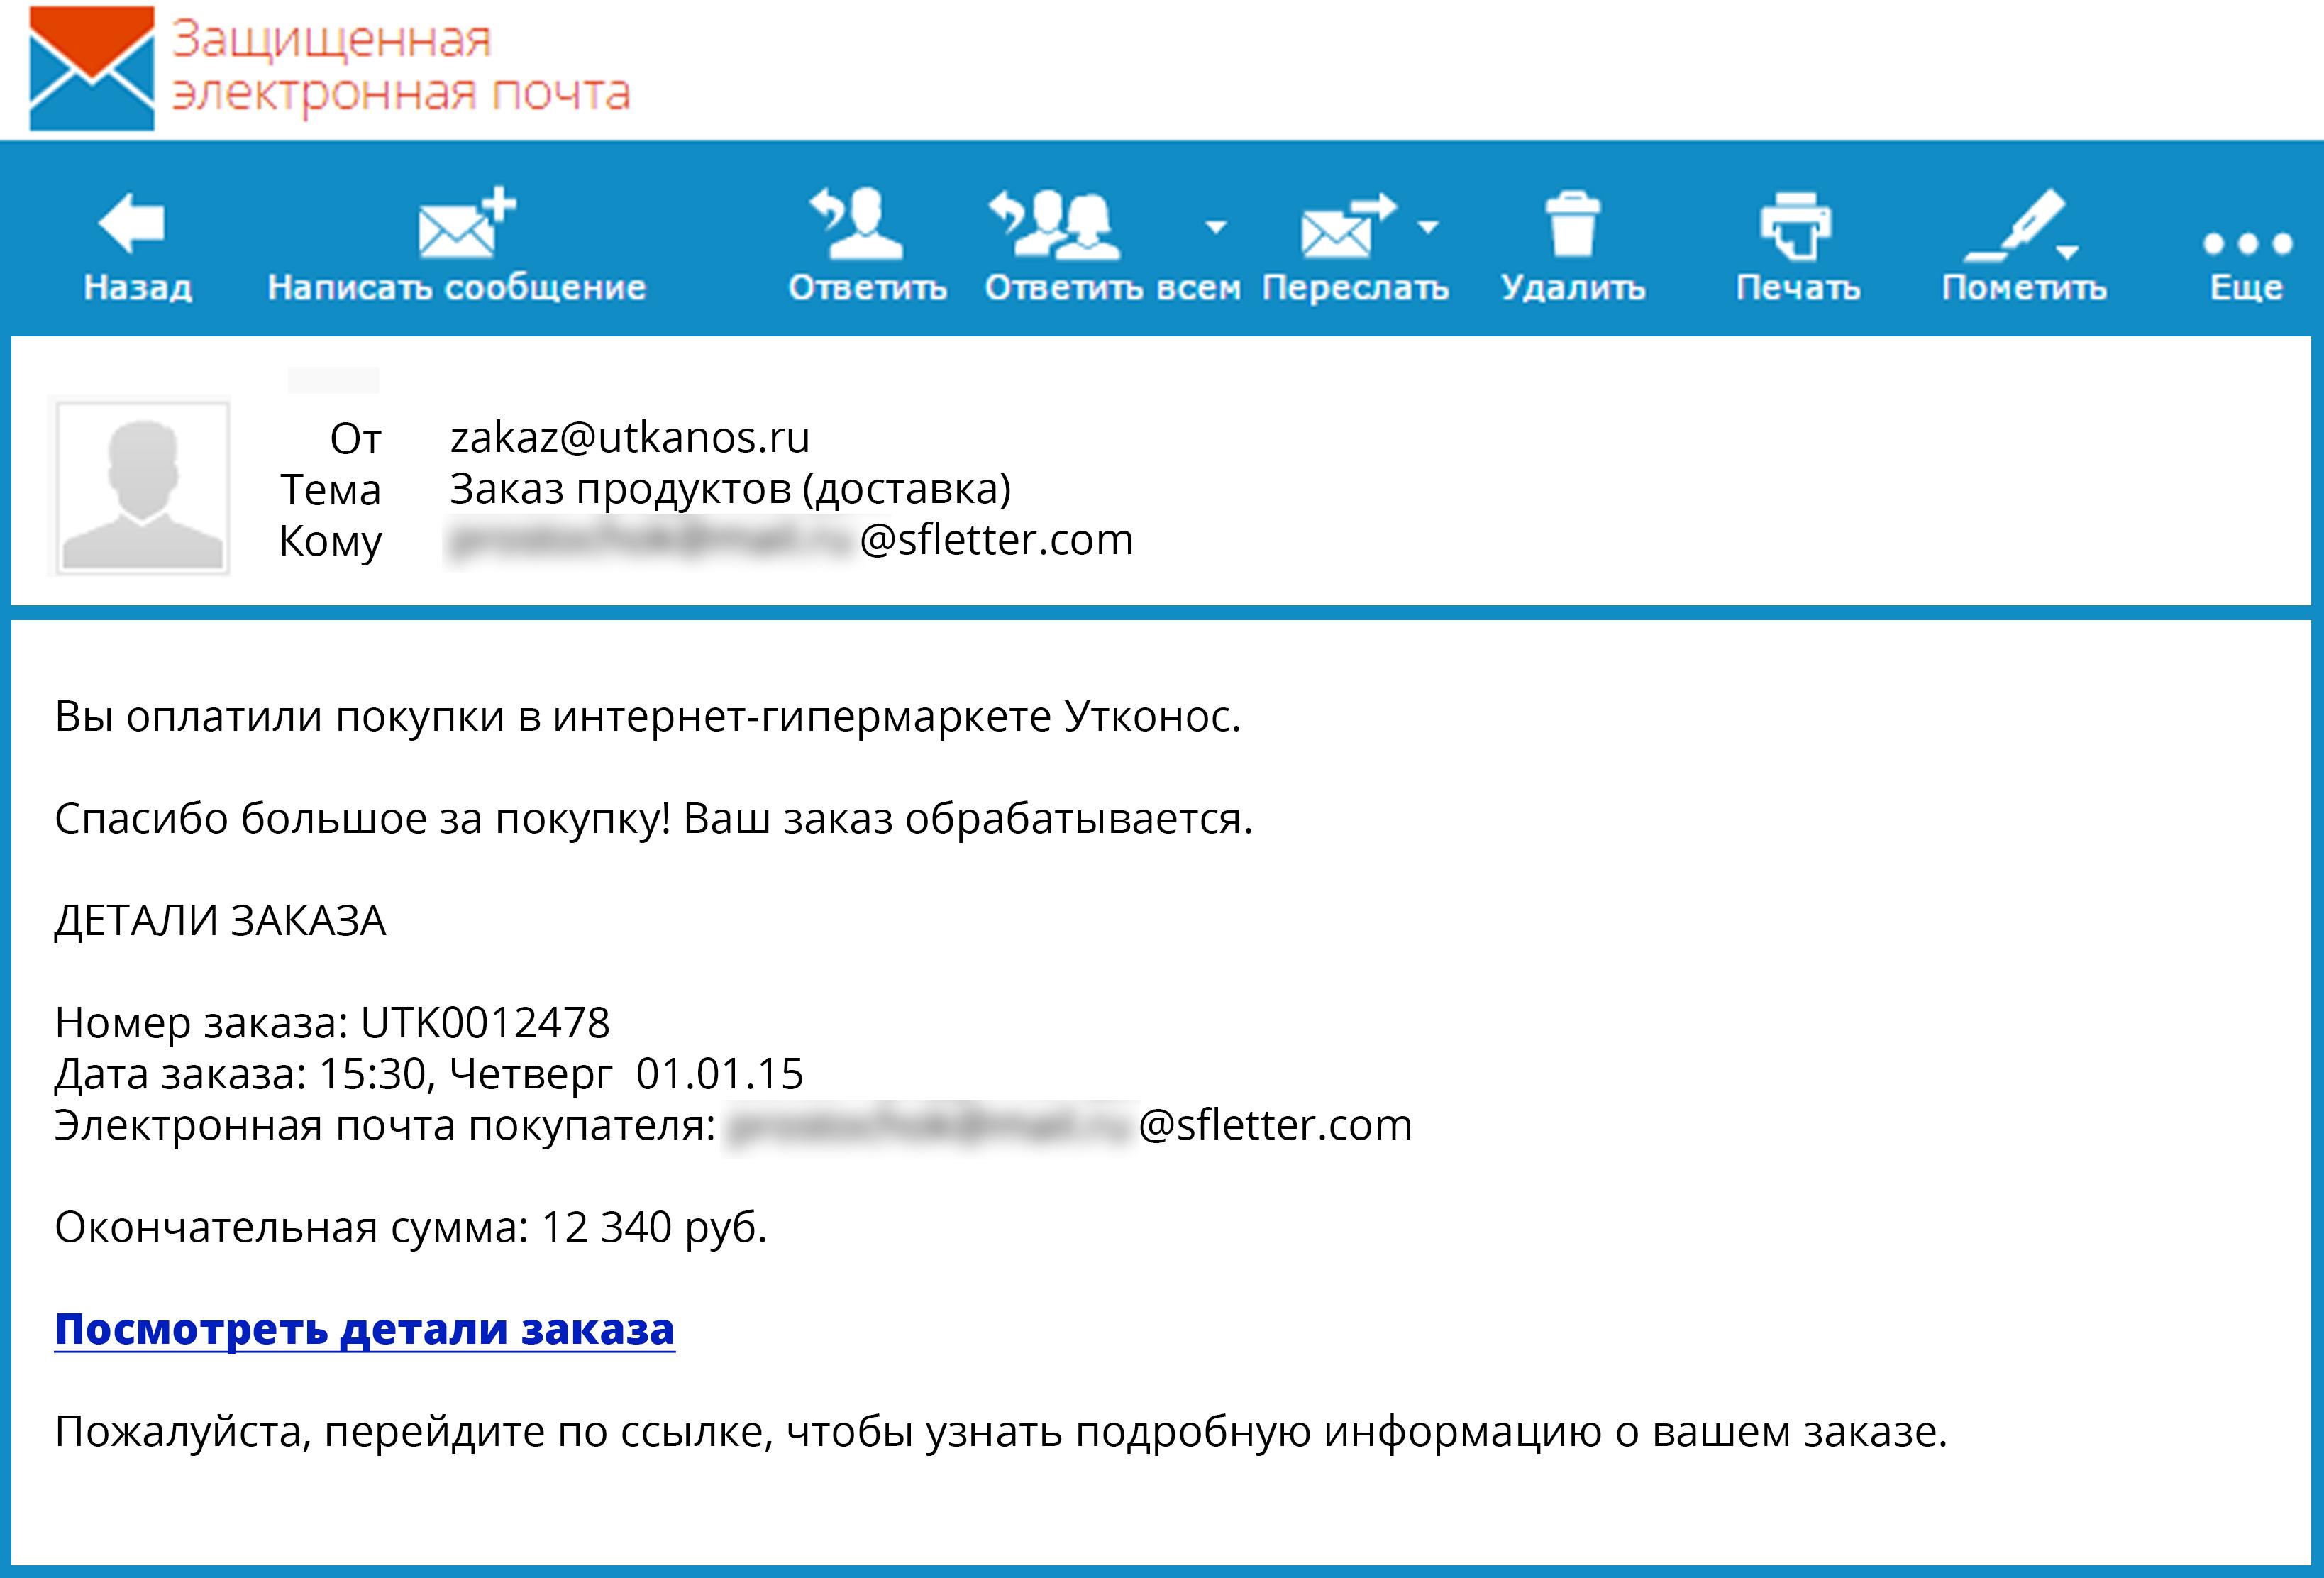 майл блог ру: